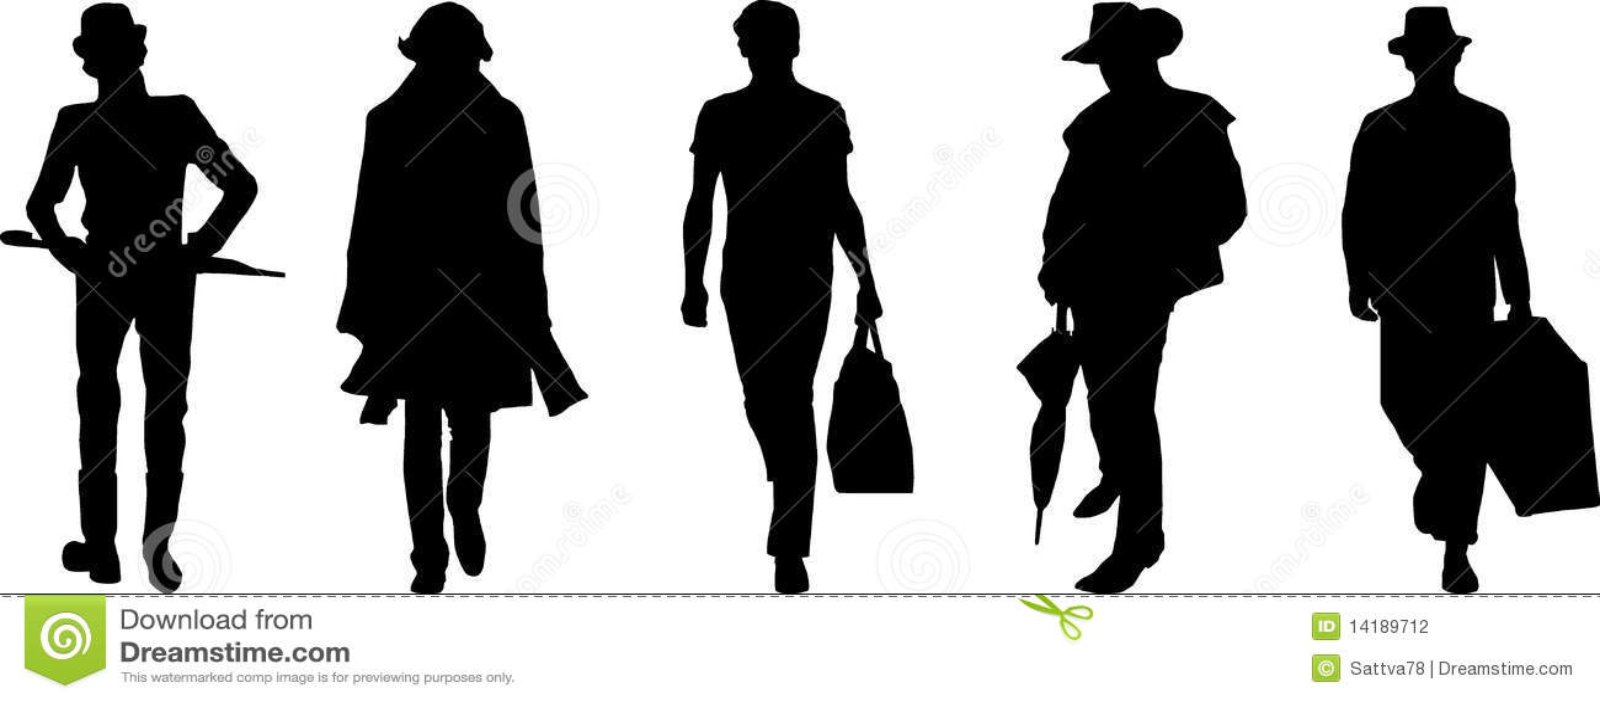 Silhouette Fashion Men Stock Photography